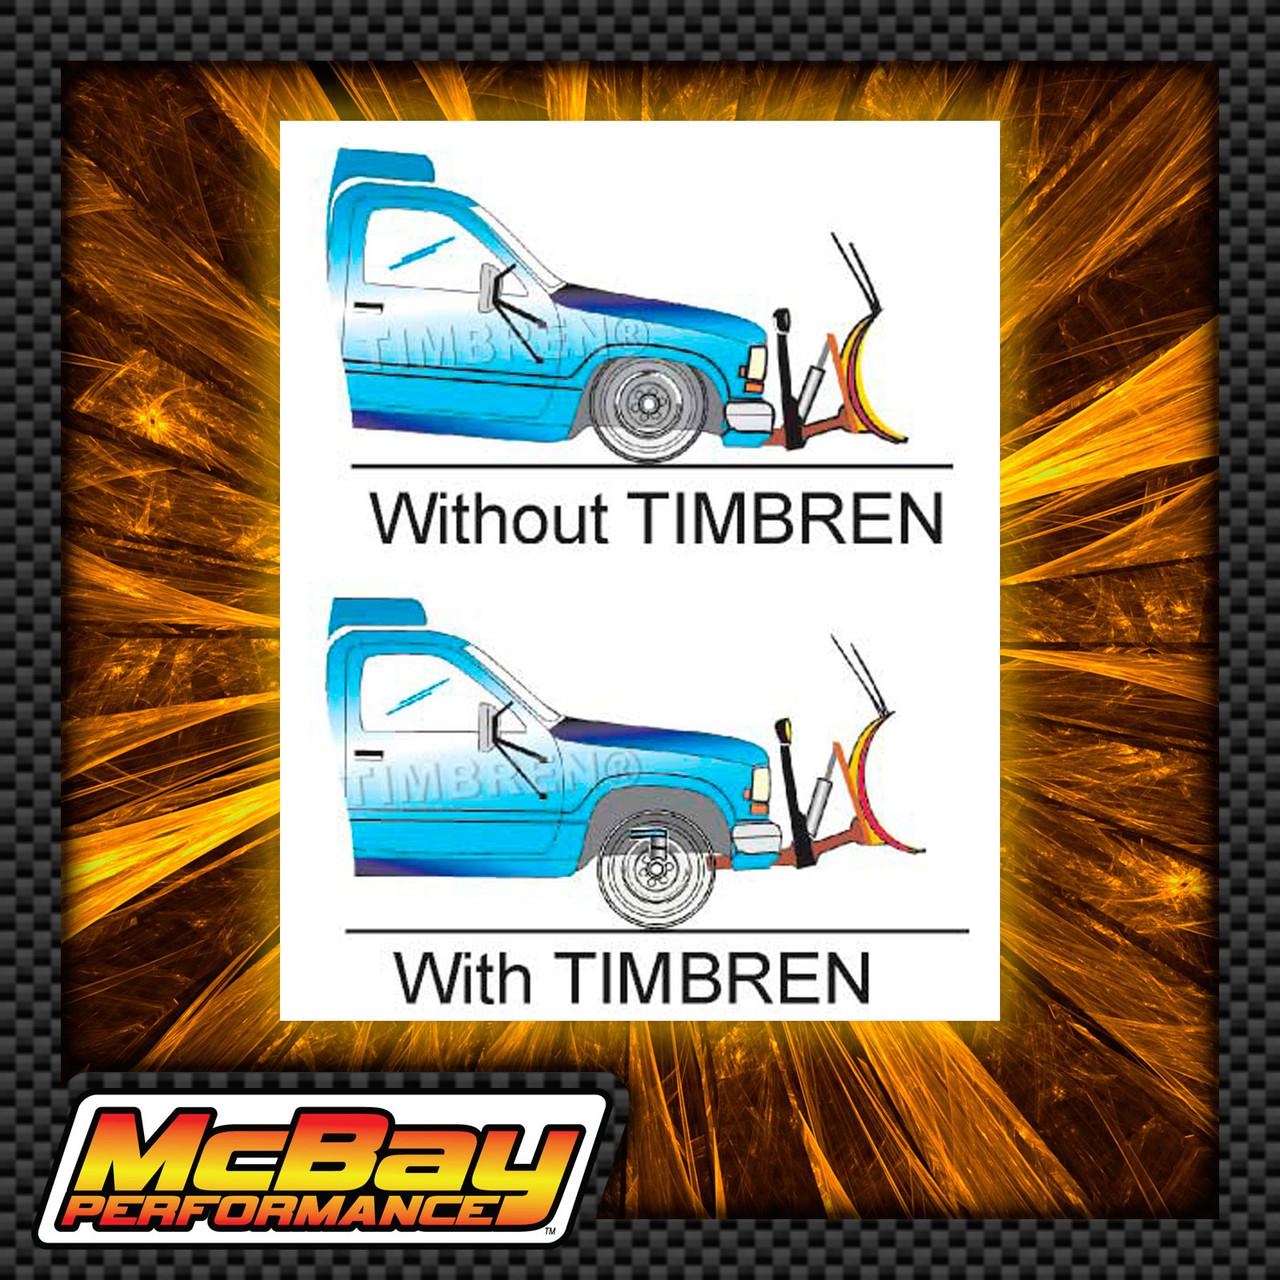 Timbren Front SES Suspension Load Leveling Kit for 1988-2000 Chevy GMC K1500 K2500 K3500 Trucks